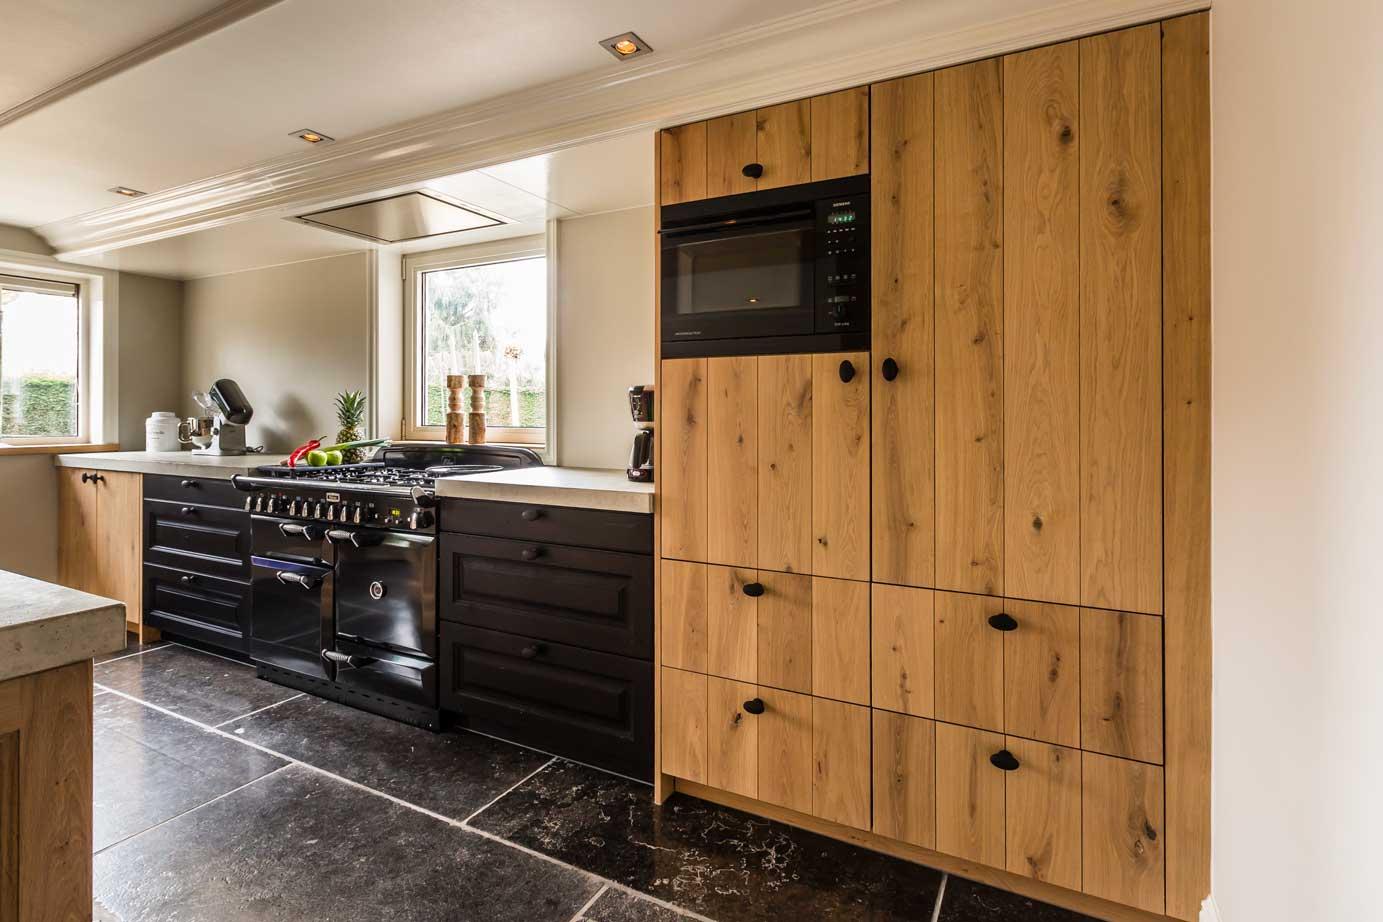 Kosten Eikenhouten Keuken : Keuken ideeën Leukste en creatiefste ideeën! DB Keukens